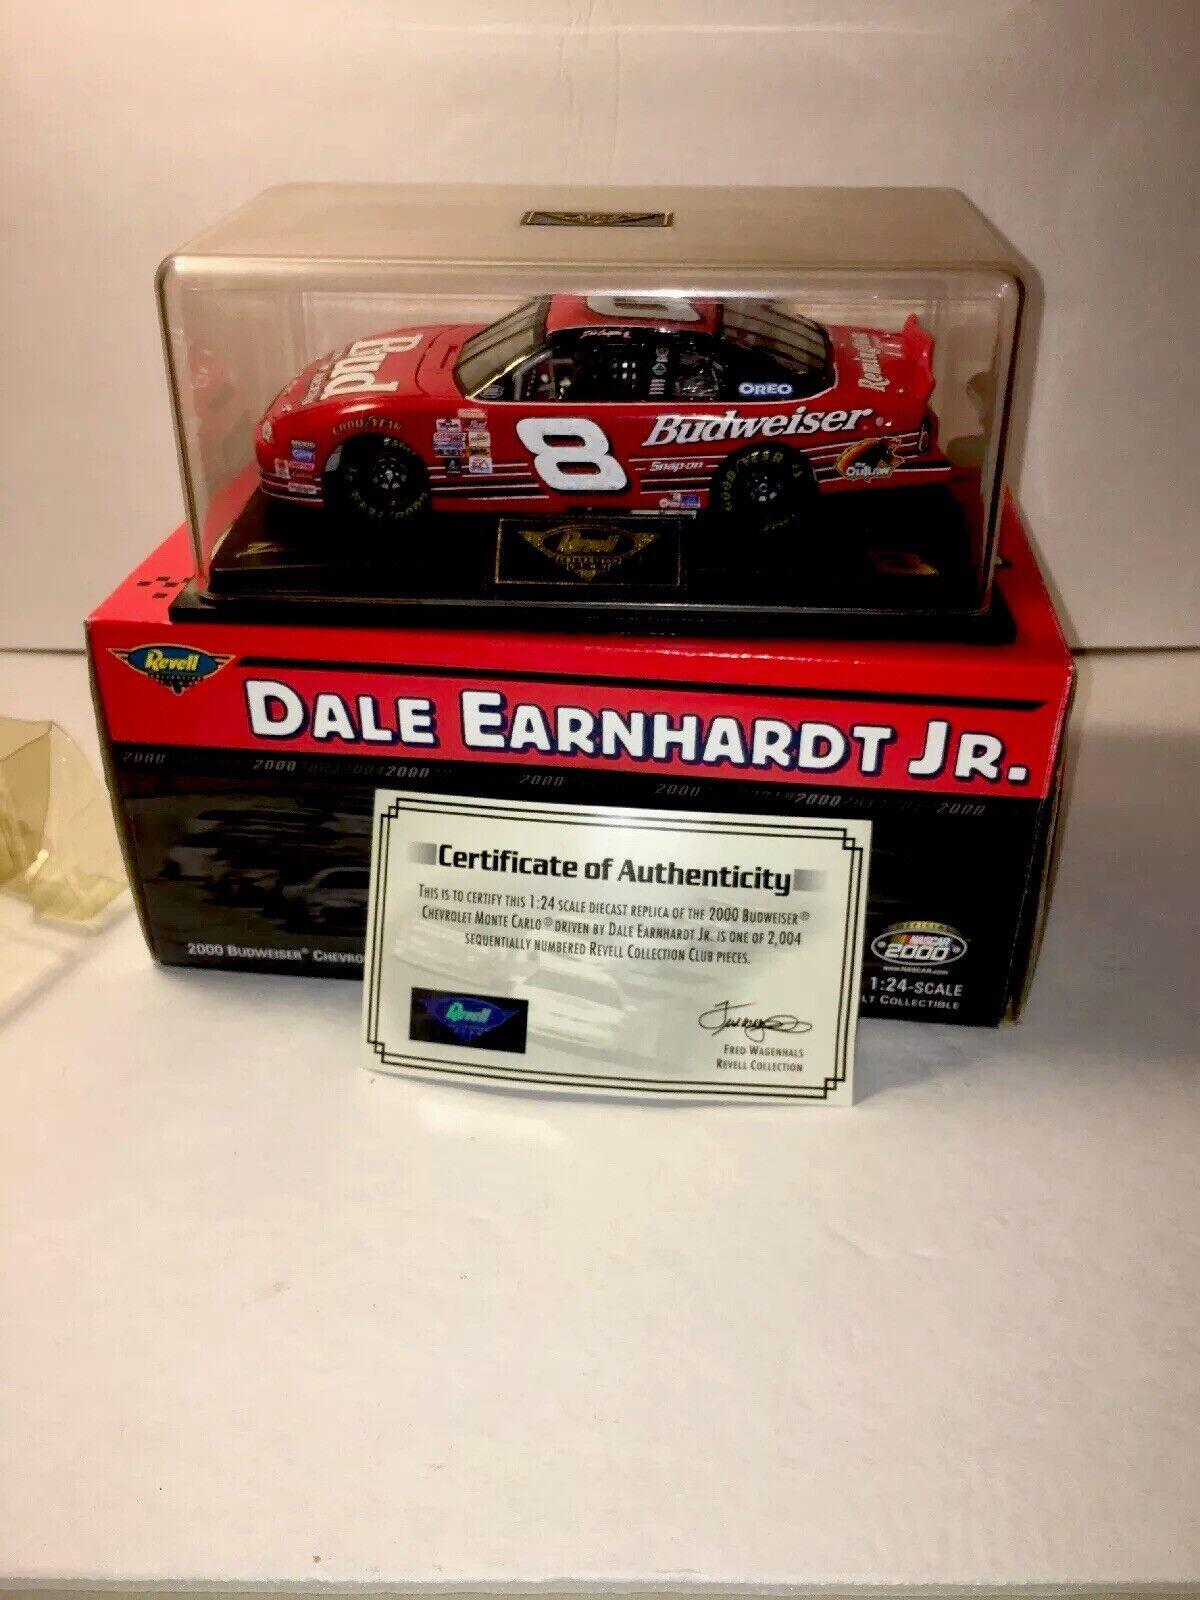 Nice  Revistas REVELL 1 24 Dale Earnhardt Jr Bud Racing 1 2, 004 Die Cast Auto NasCoche Nuevo